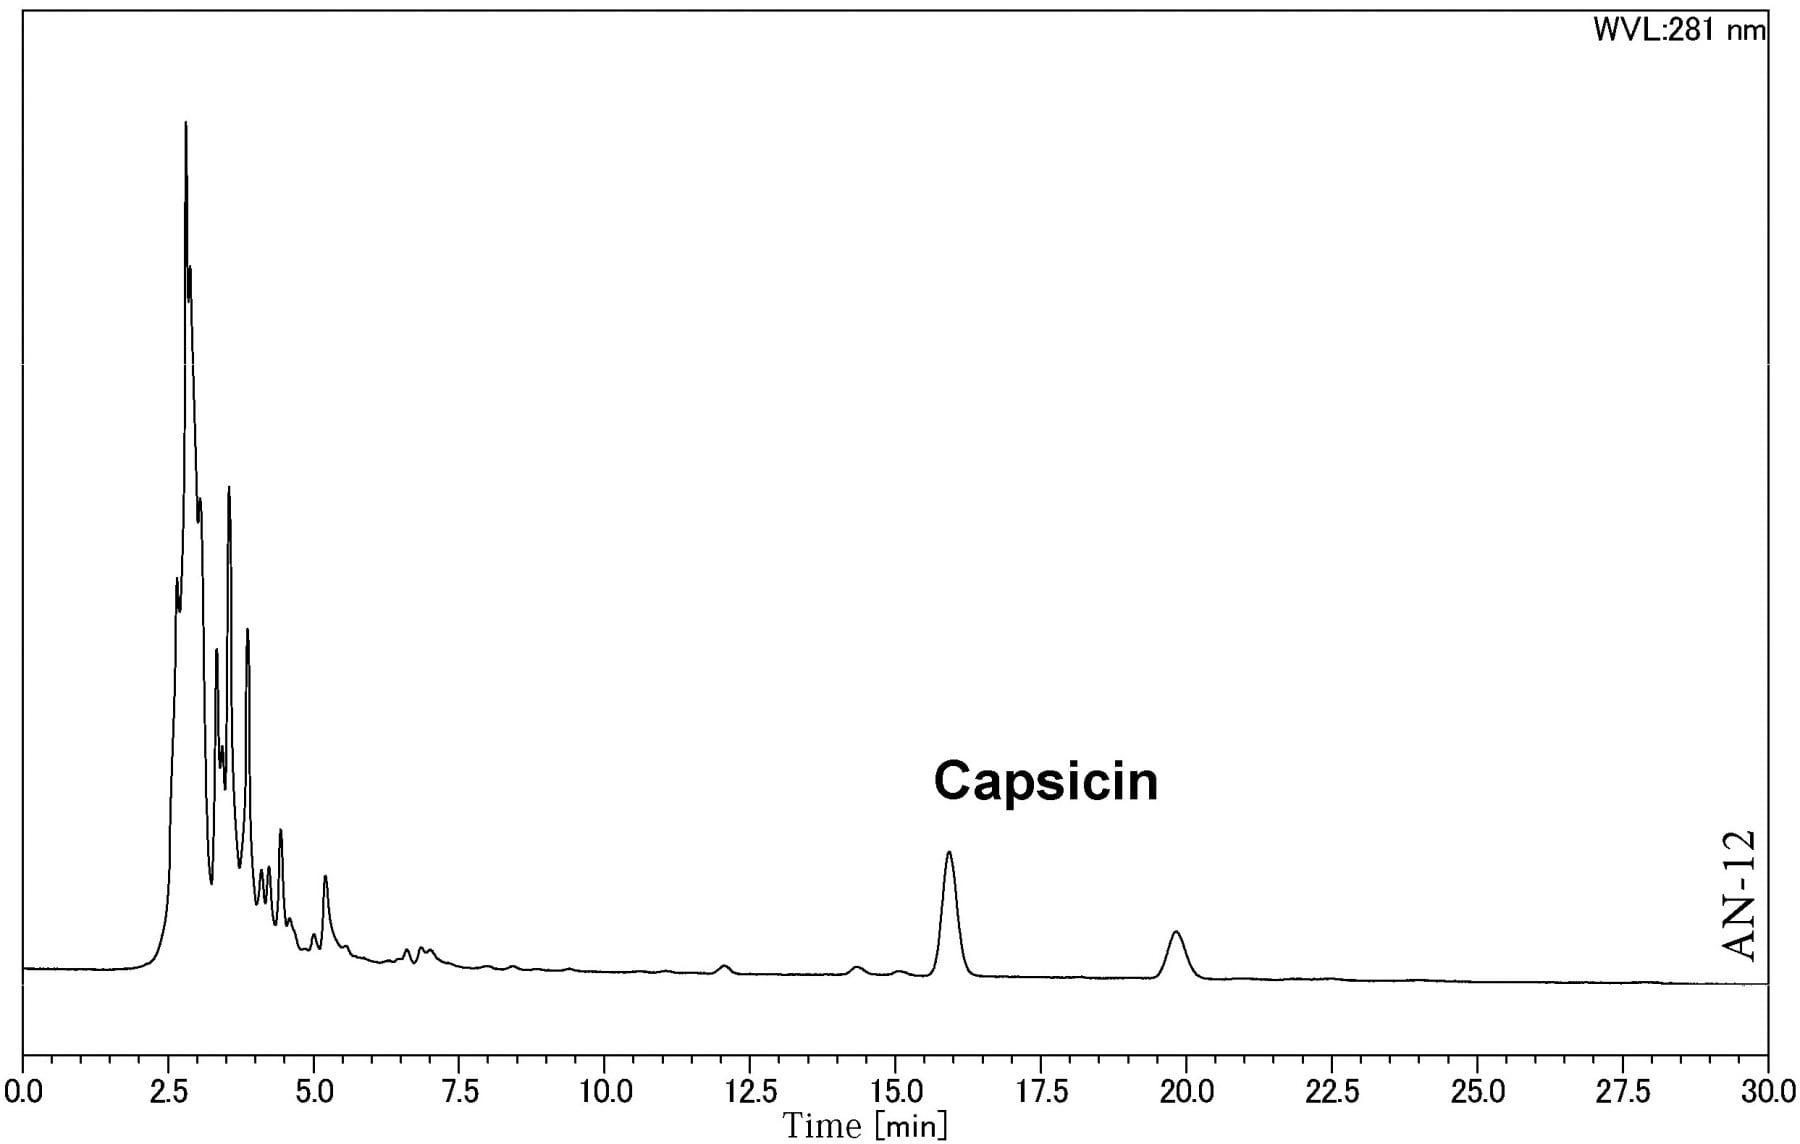 Analysis of Capsaicin in Tabasco using HPLC-UV